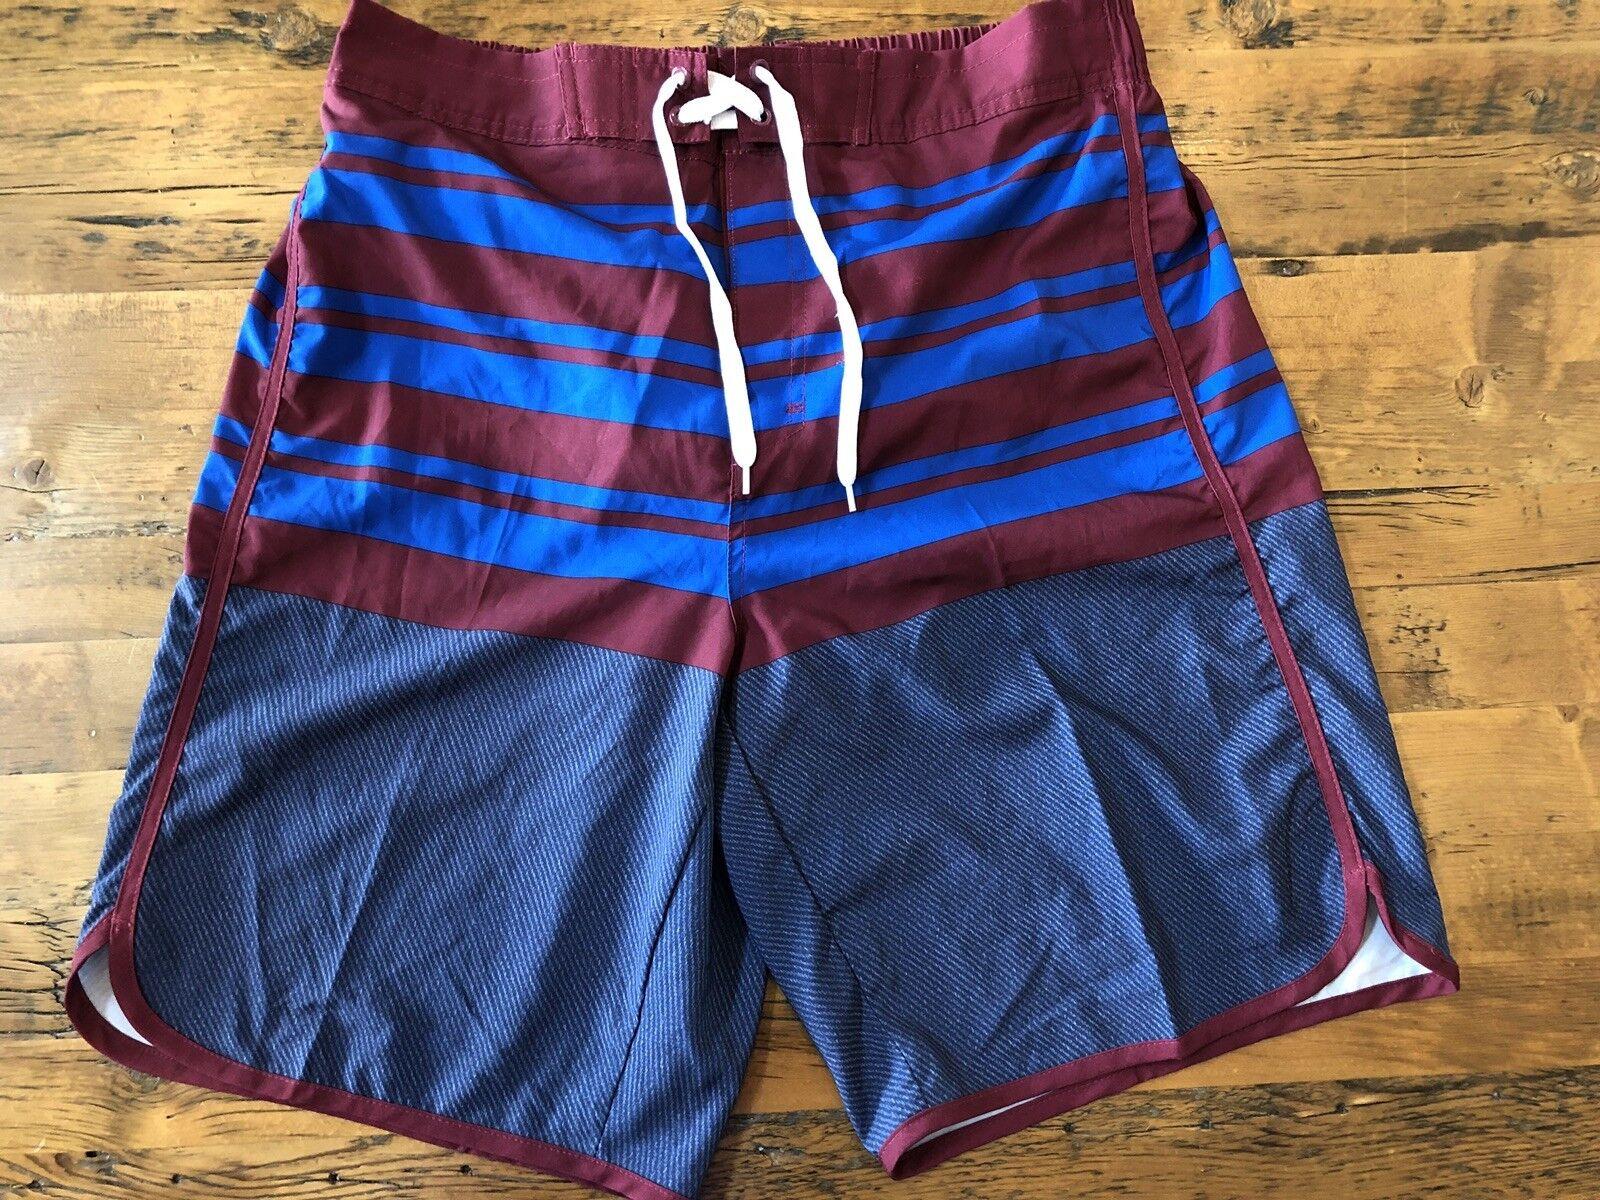 FC Barcelona Mens Size 34 Swim Trunks Stretch Board Shorts FCB Spain Official